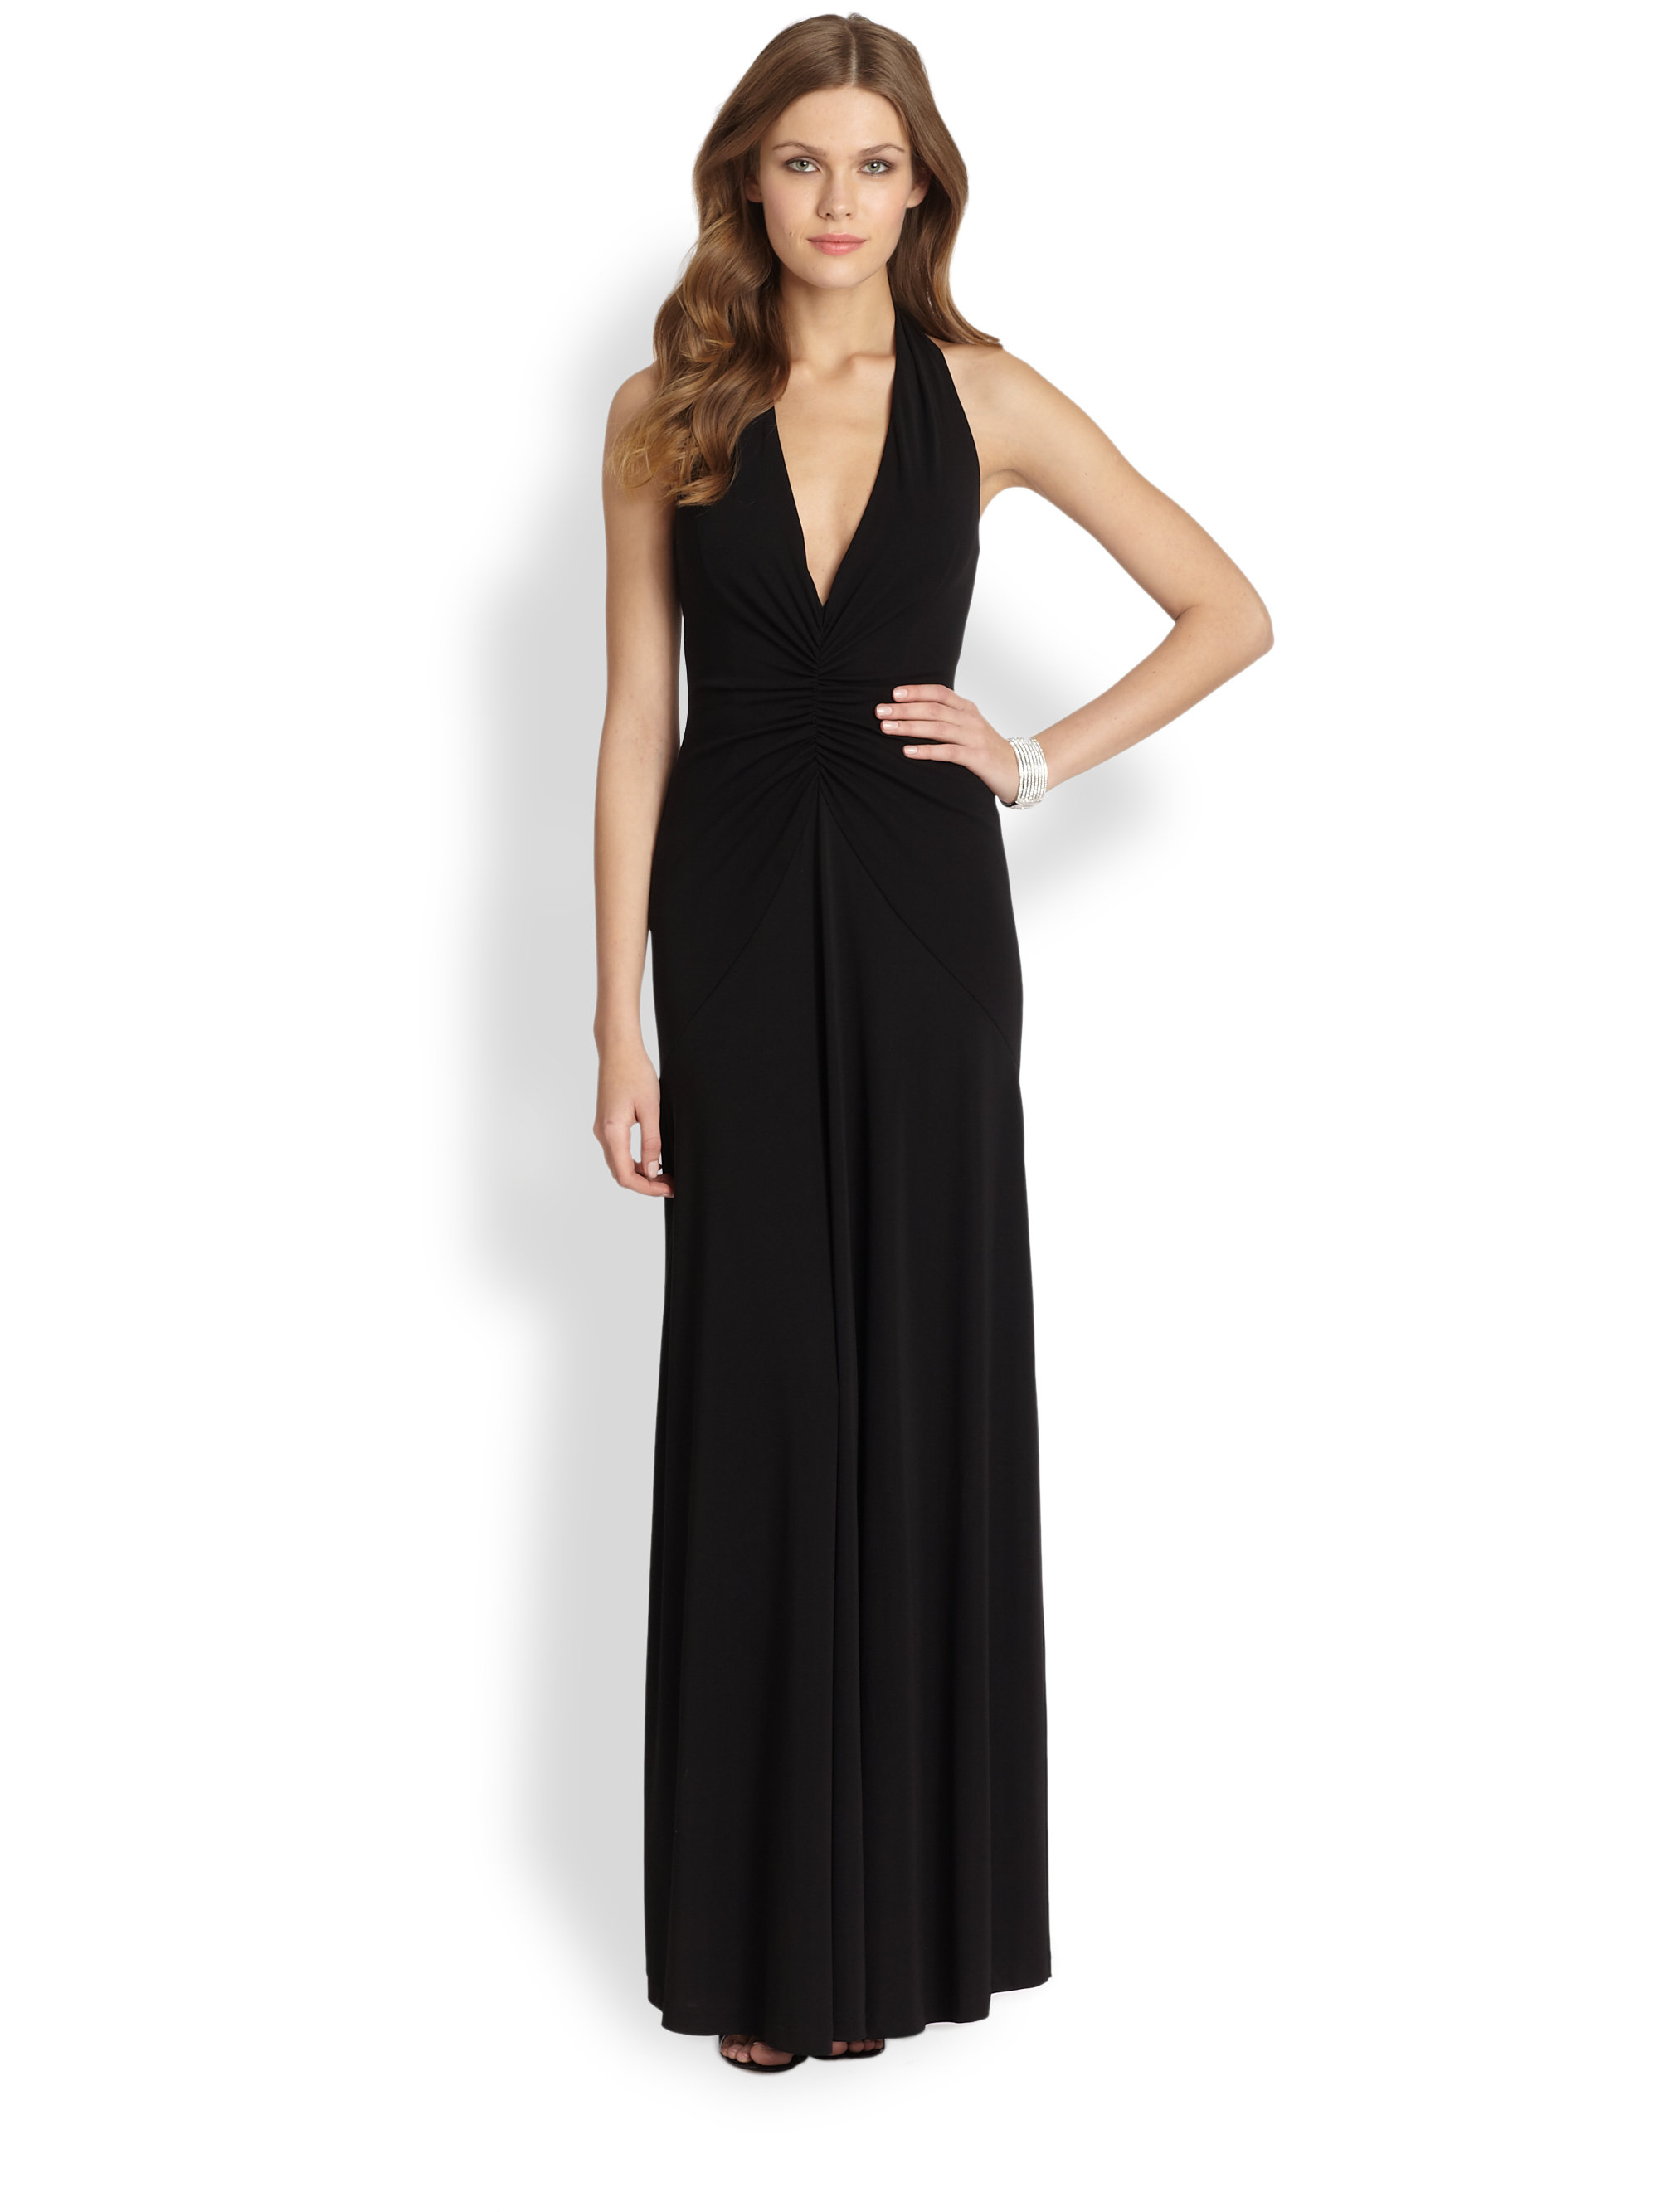 Lyst - Nicole Miller Jersey Halter Gown in Black